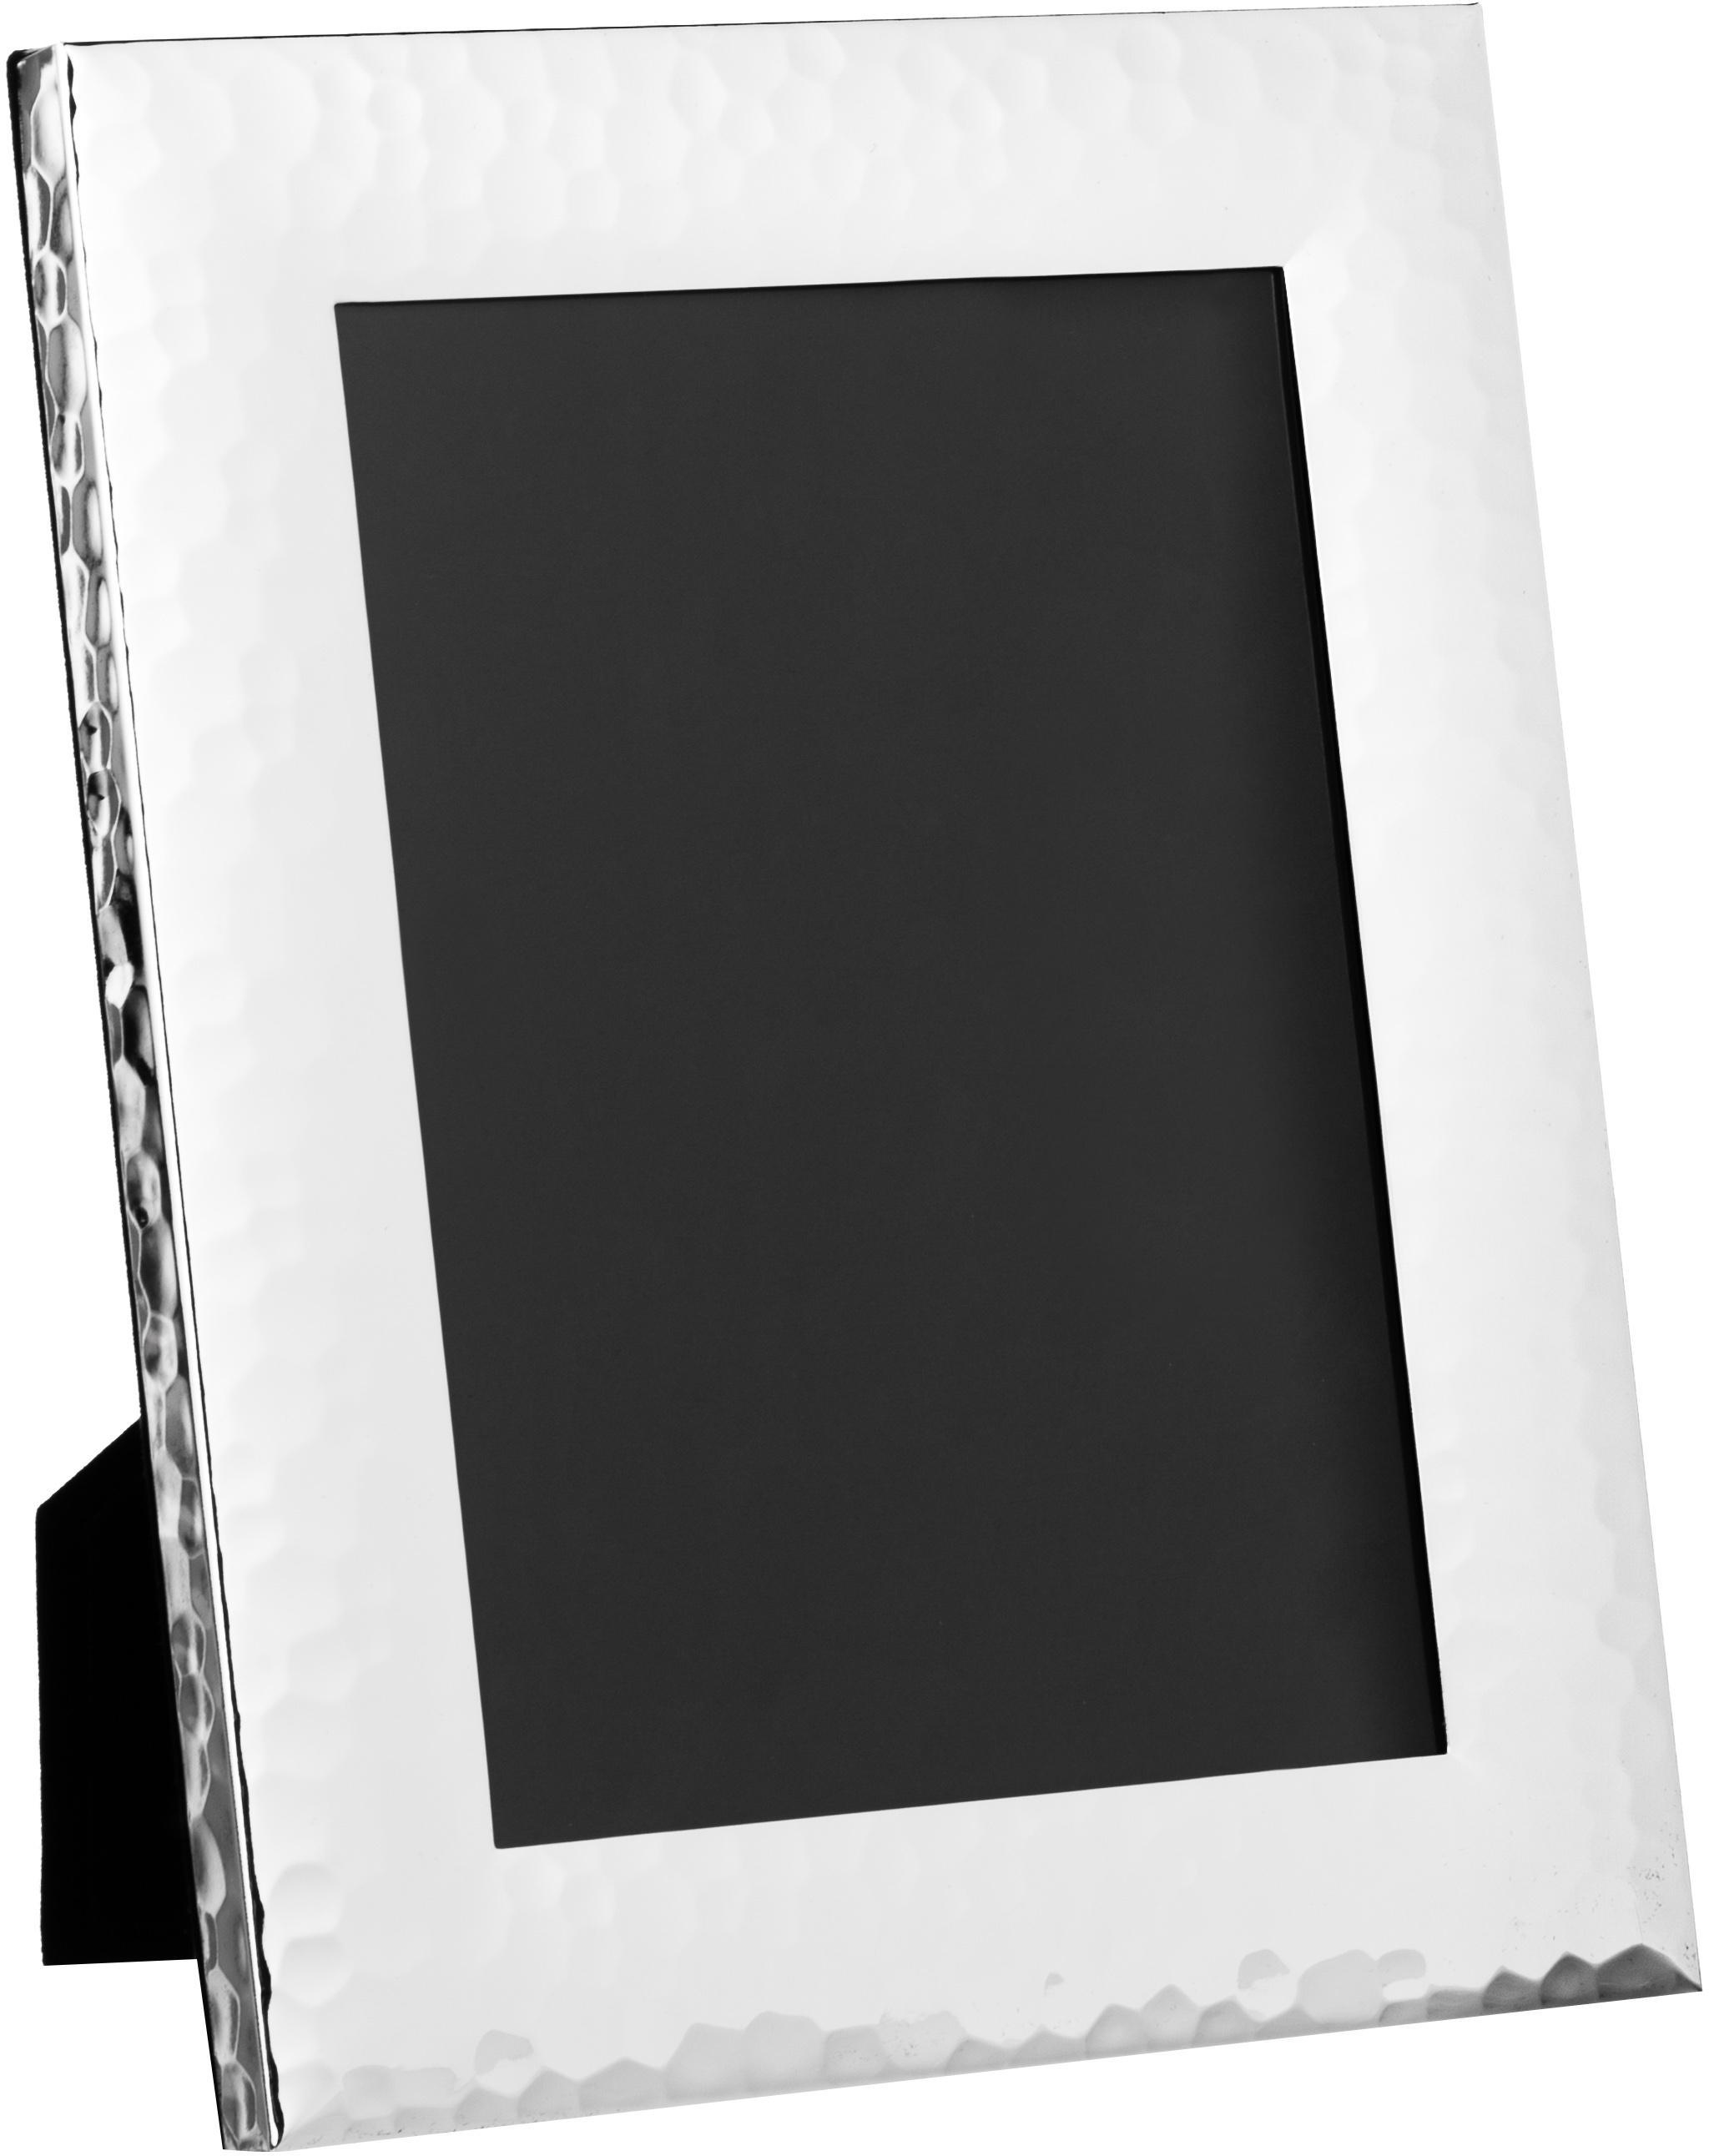 Cornice Gubbio, Cornice: metallo, argentato, Argento, 13 x 18 cm